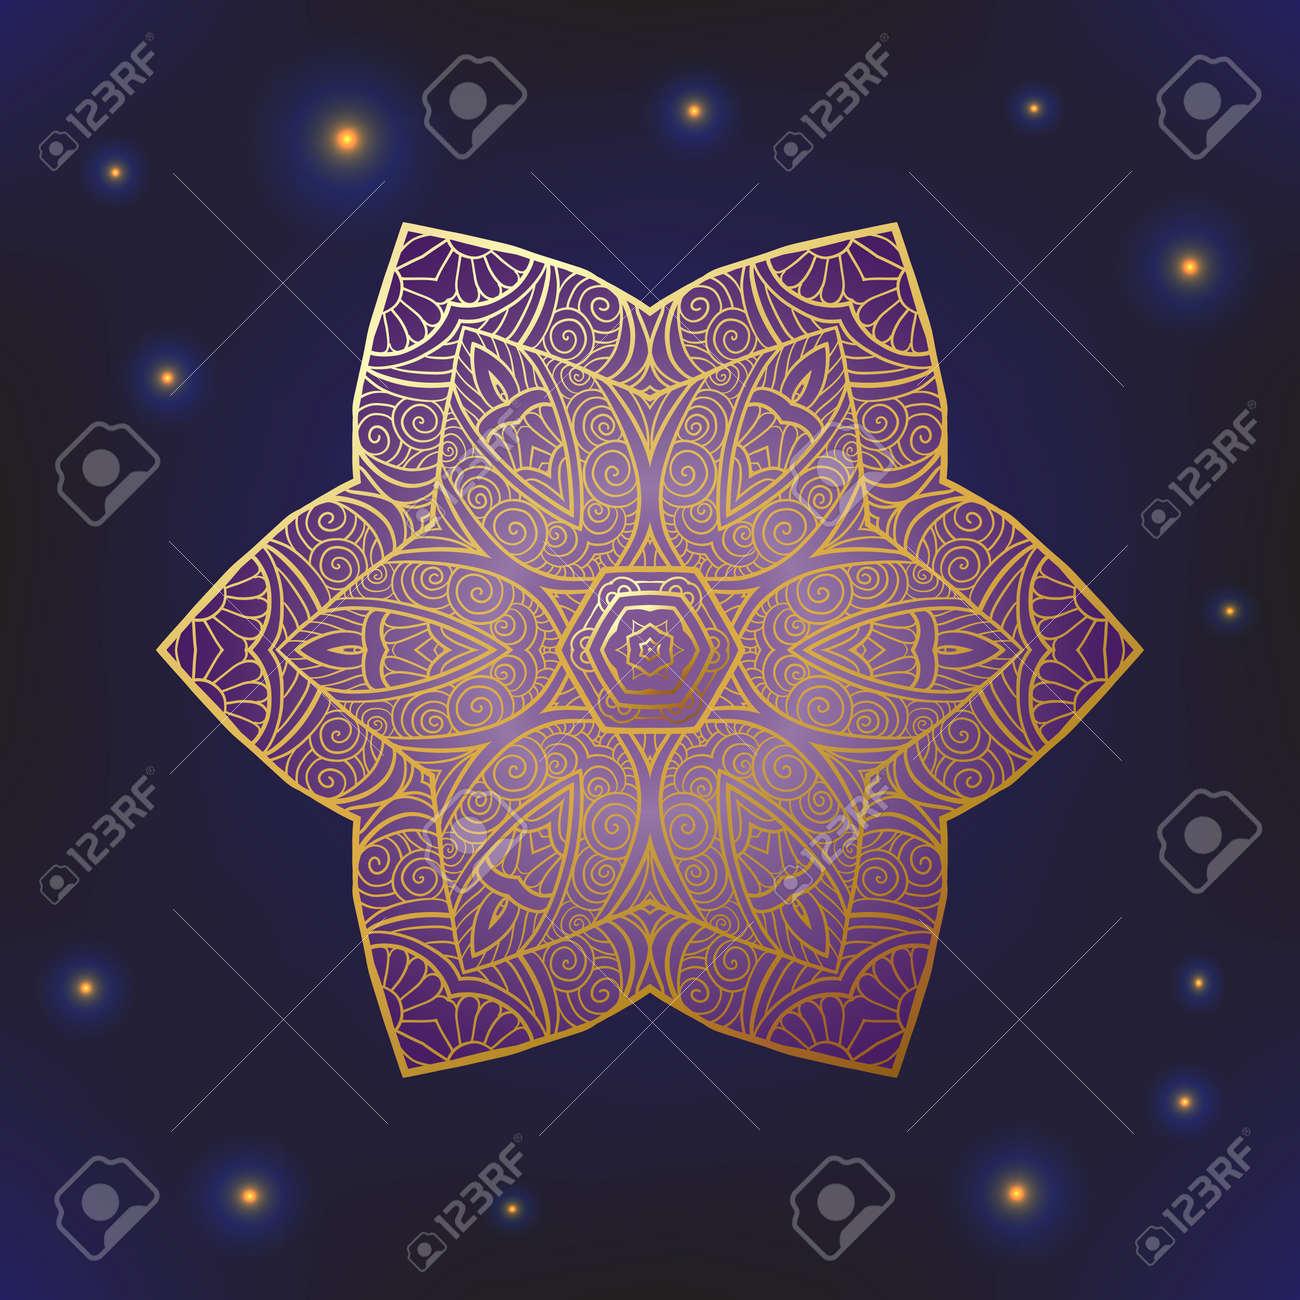 Decorative ornate Indian or Arabian round lace mandala. Snowflake. Vintage vector pattern. Invitation, wedding card, scrapbooking. Christmas card design. Gold over black. Colored vector illustration. - 60503044